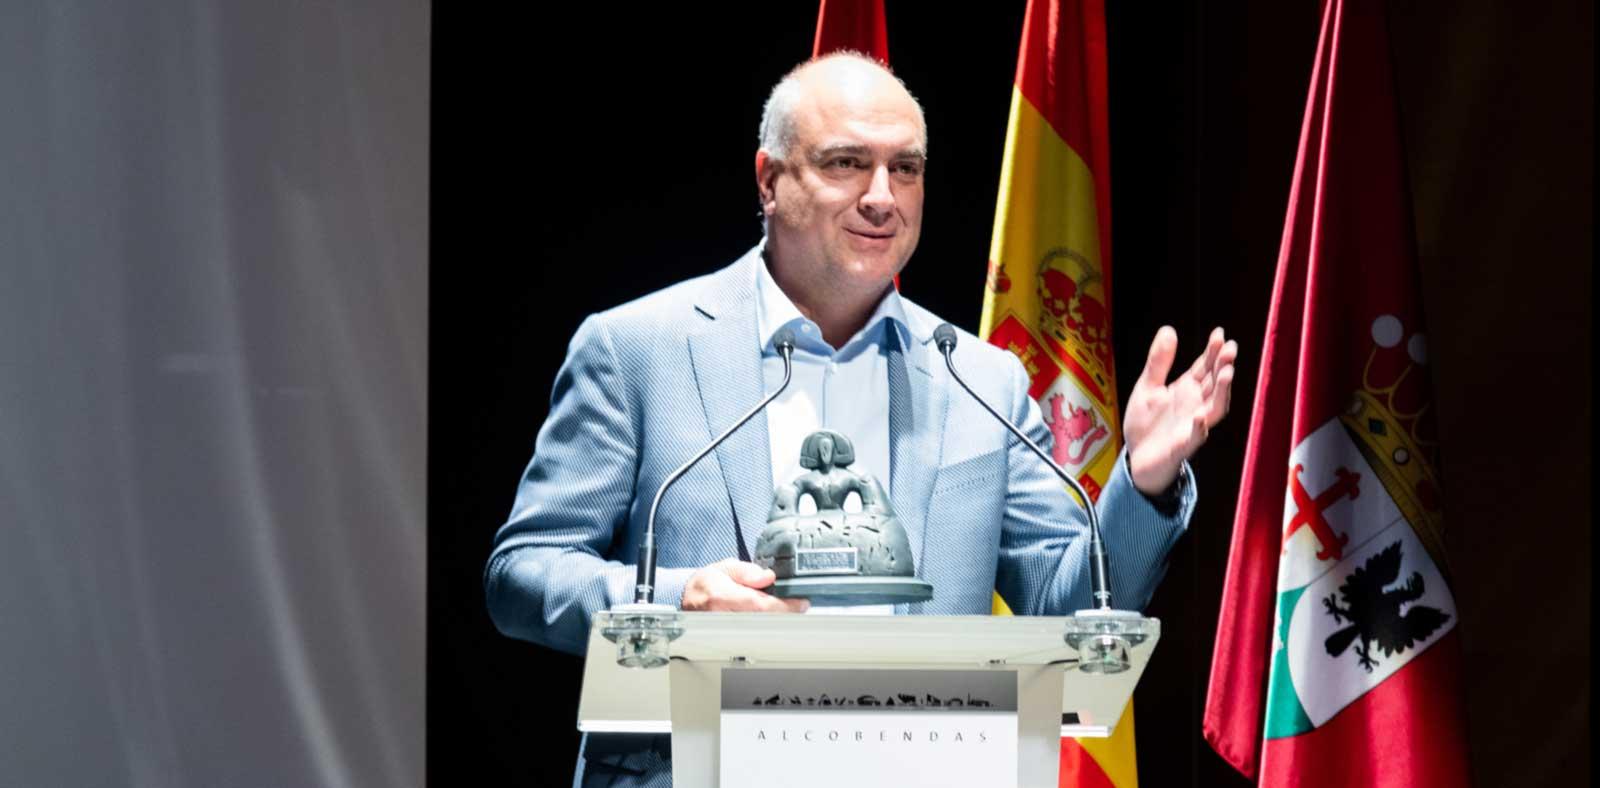 Net-Pharma awarded in the first edition of company and innovative entrepreneurship awards in Alcobendas